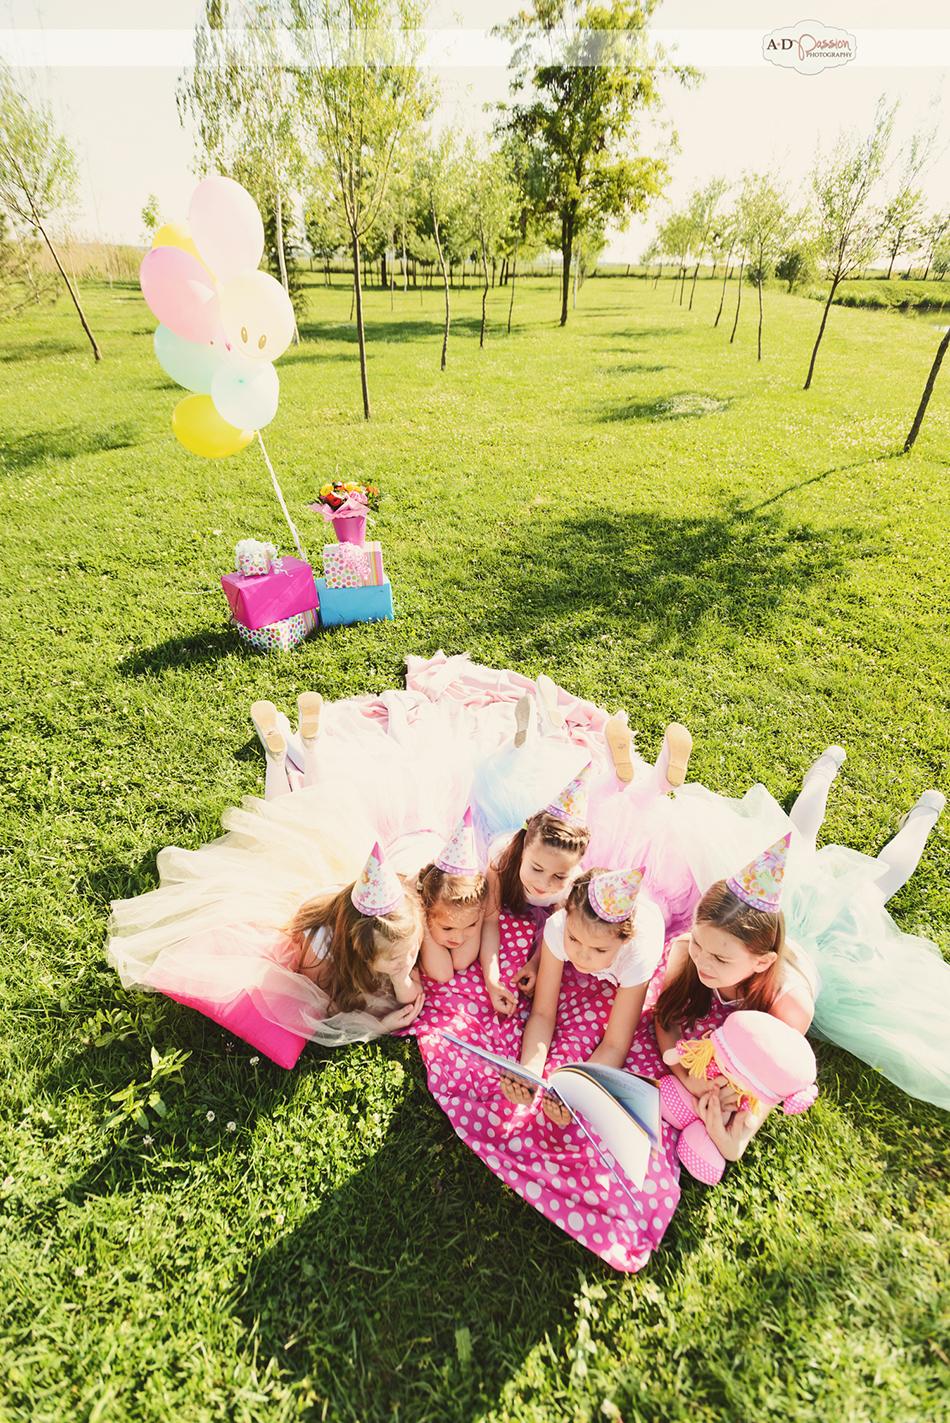 AD Passion Photography | party-fetite-fotograf-copii-timisoara_0006 | Adelin, Dida, fotograf profesionist, fotograf de nunta, fotografie de nunta, fotograf Timisoara, fotograf Craiova, fotograf Bucuresti, fotograf Arad, nunta Timisoara, nunta Arad, nunta Bucuresti, nunta Craiova